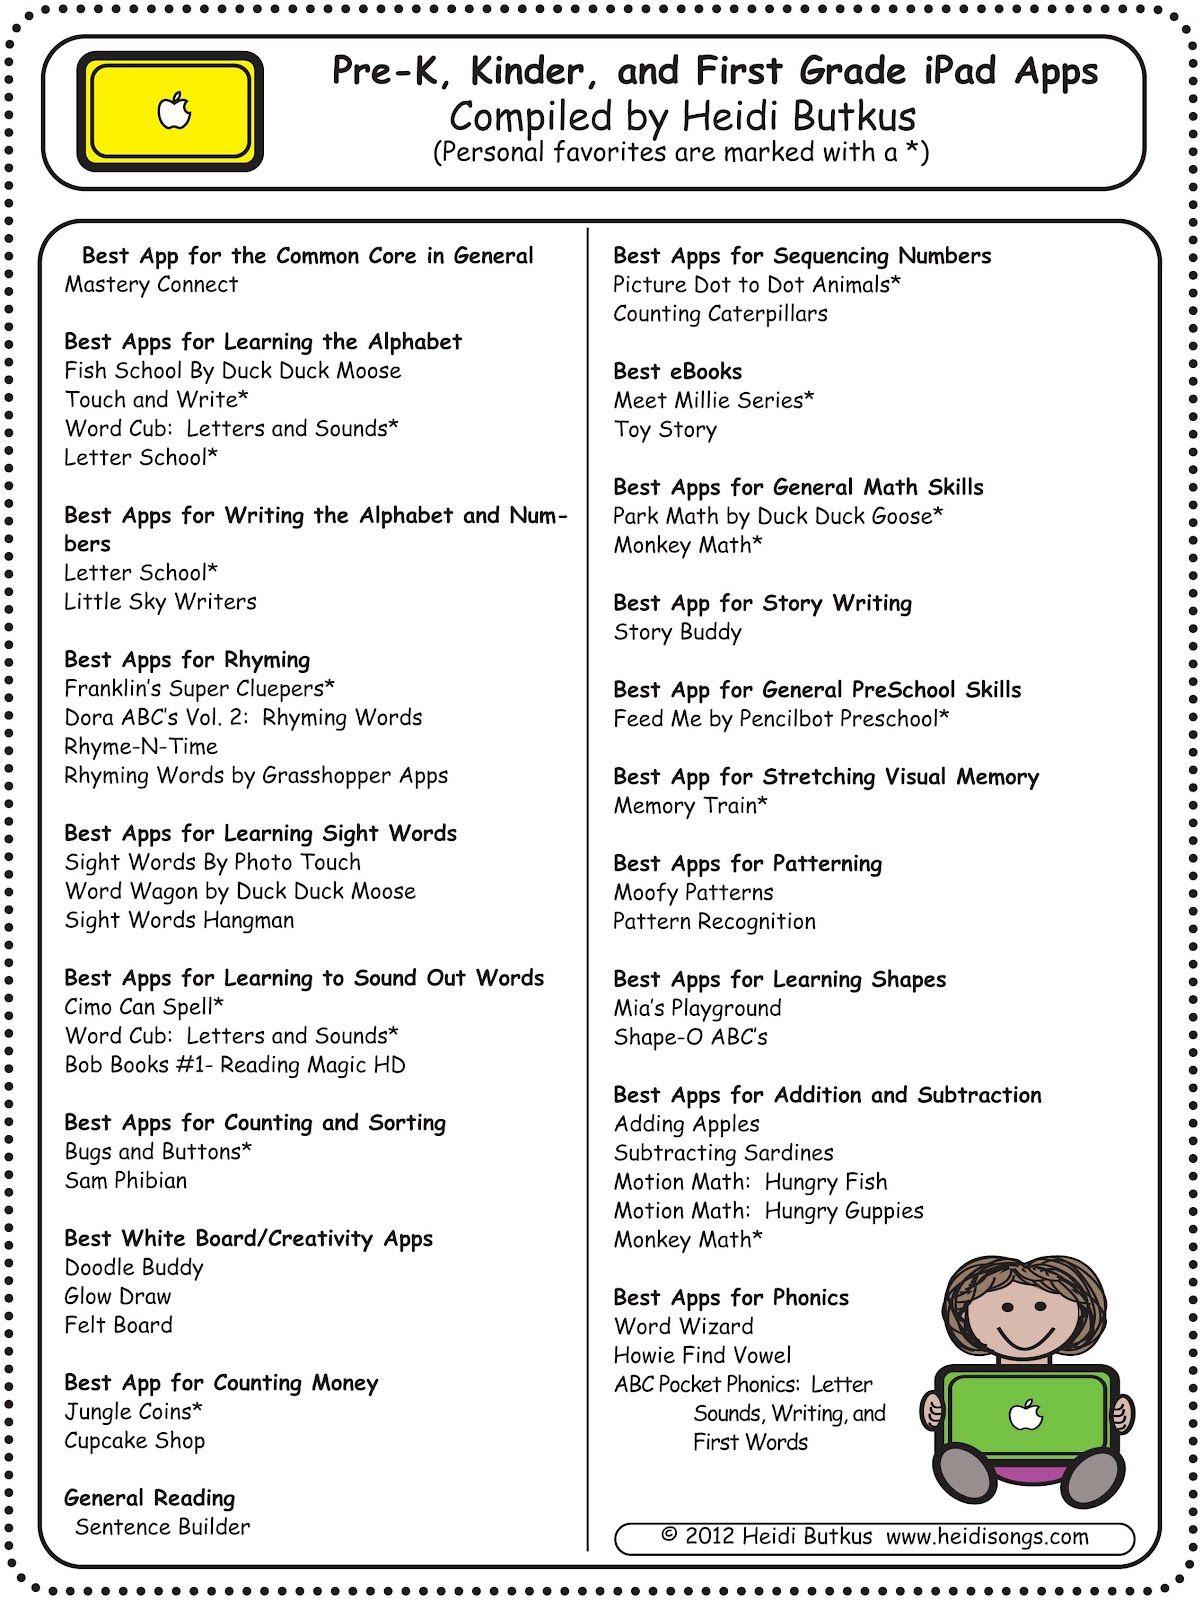 Heidisongs Resource Downloadable List Of Favorite Ipad